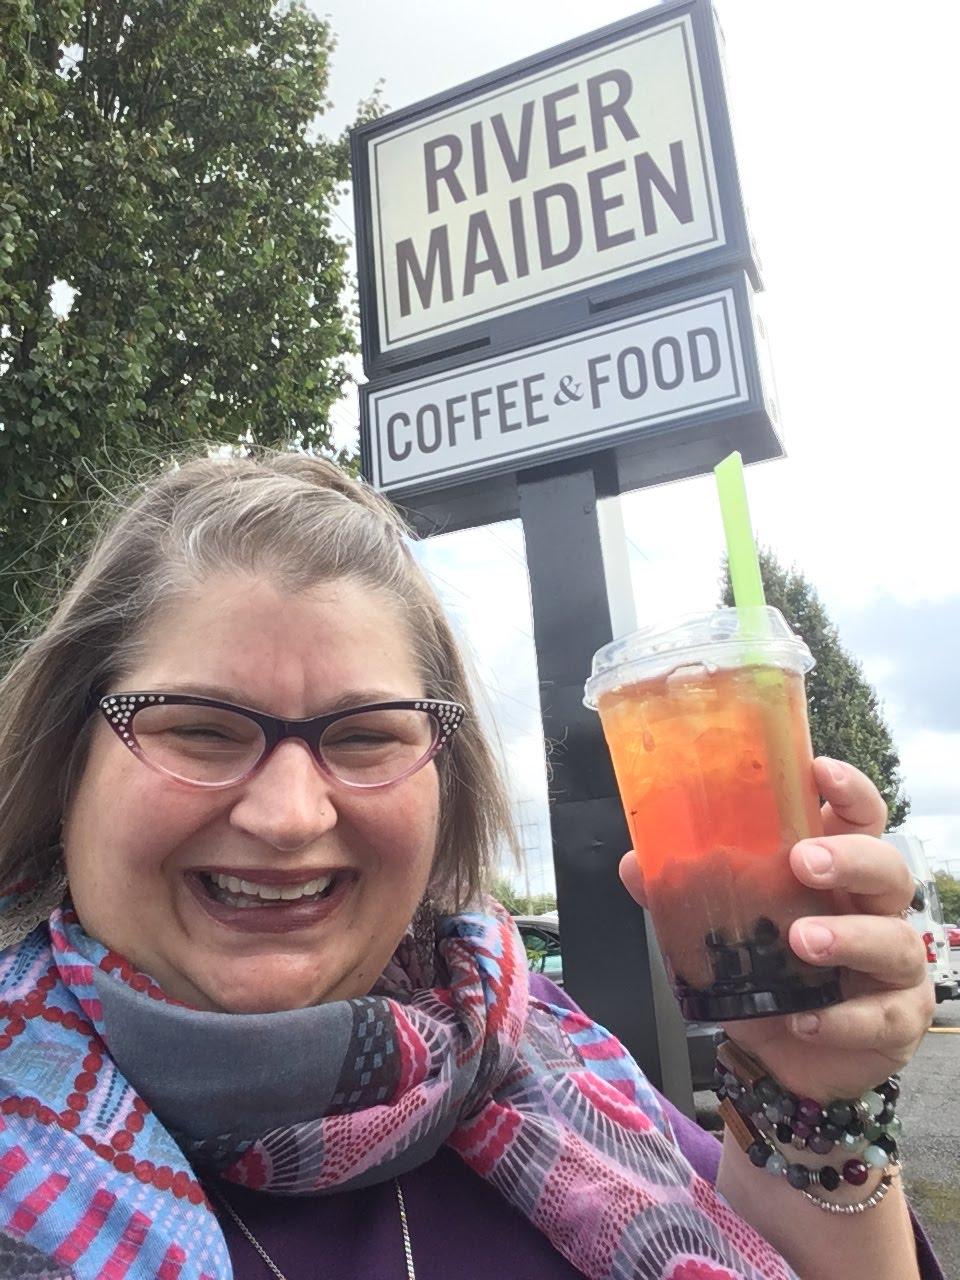 2019 River Maiden, Black Tea Spiced Boba, Vancouver WA